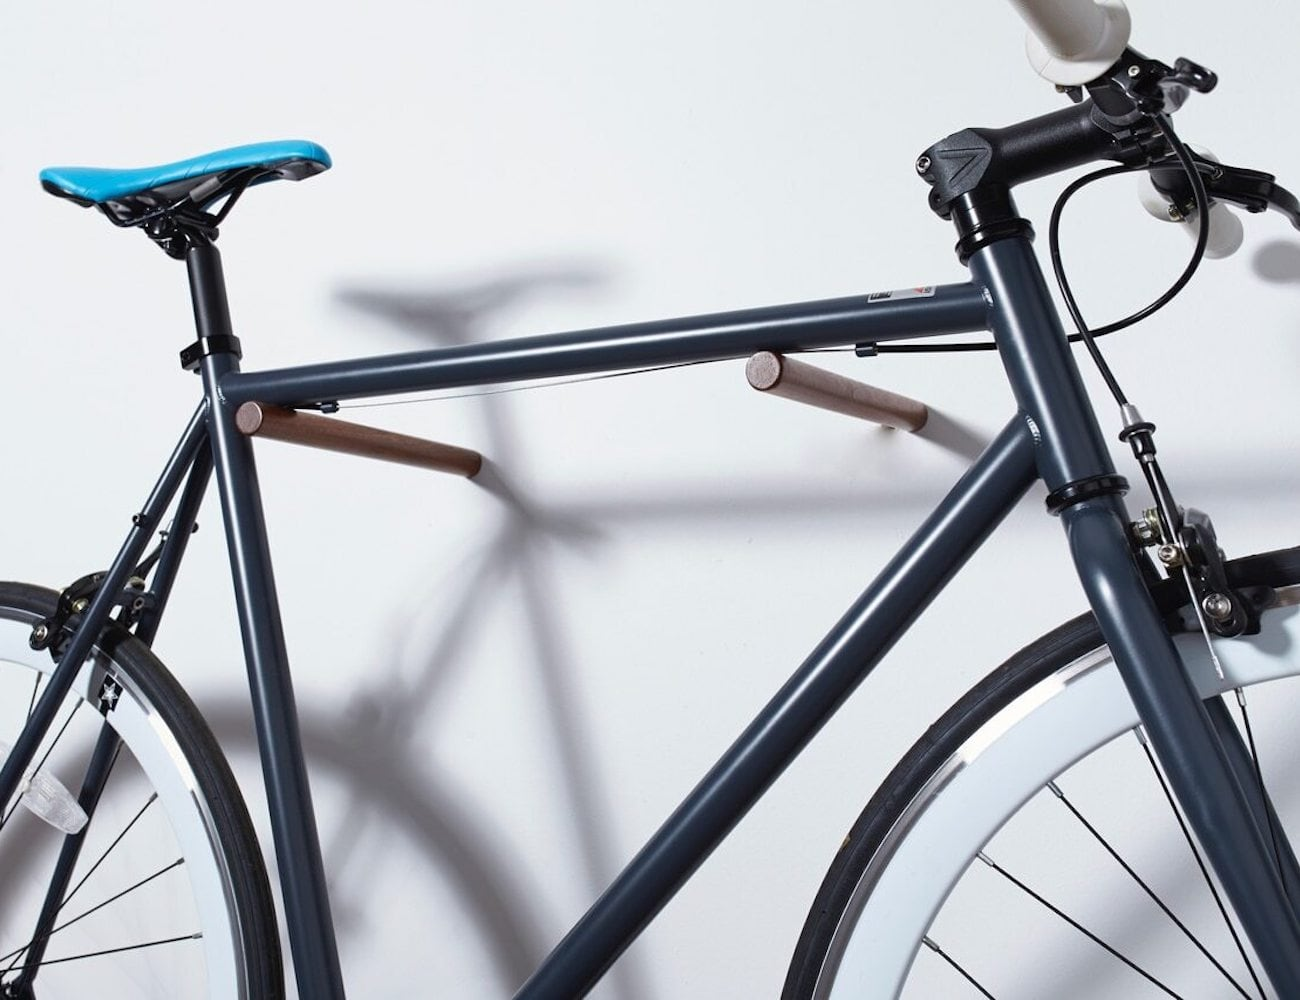 Loma Living Fenwick Bike Sticks Bicycle Wall Mount is a stylish storage solution